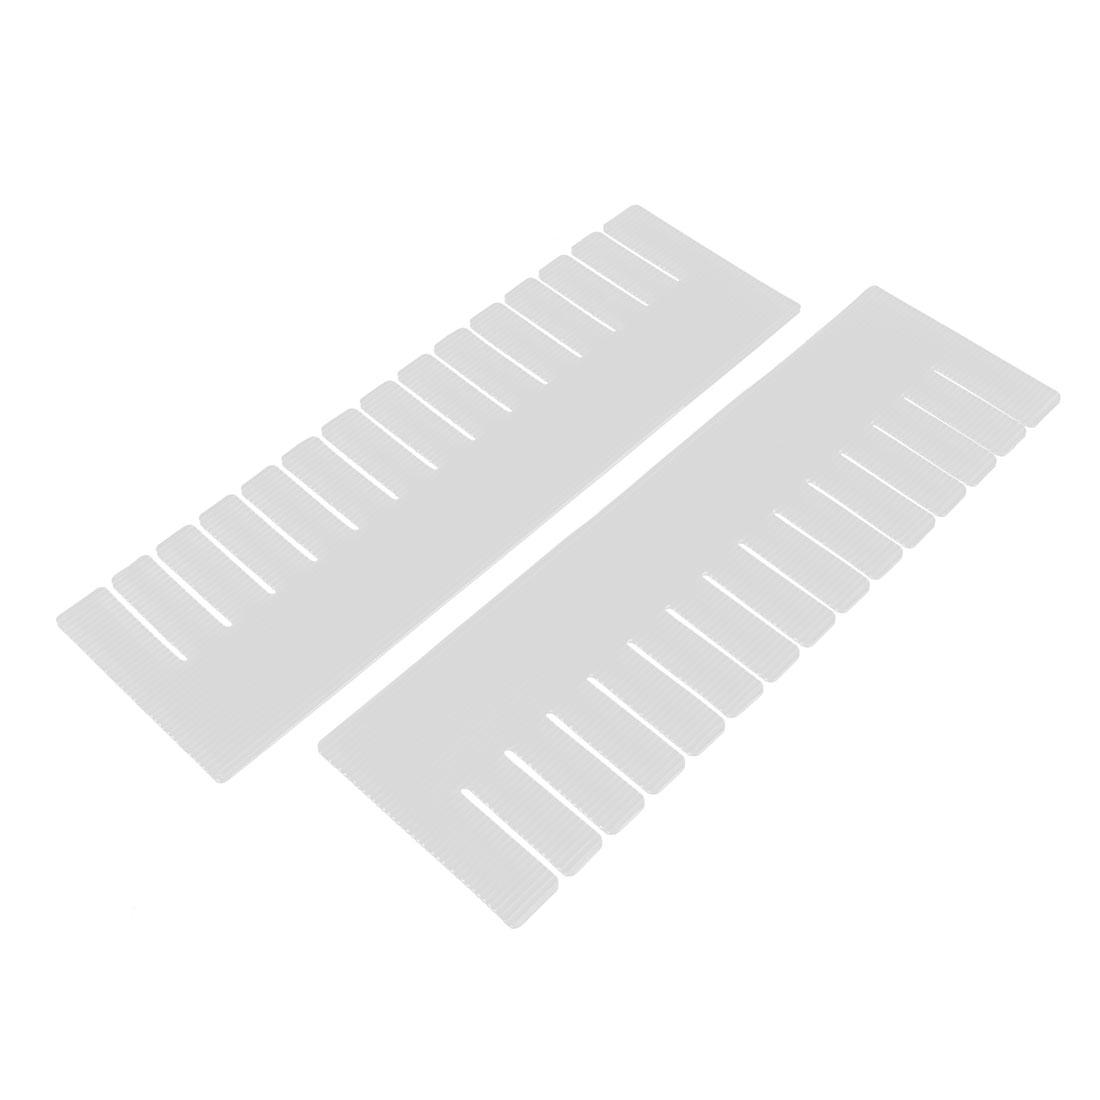 Plastic DIY Grid Drawer Divider Household Necessities Storage 2 Pcs